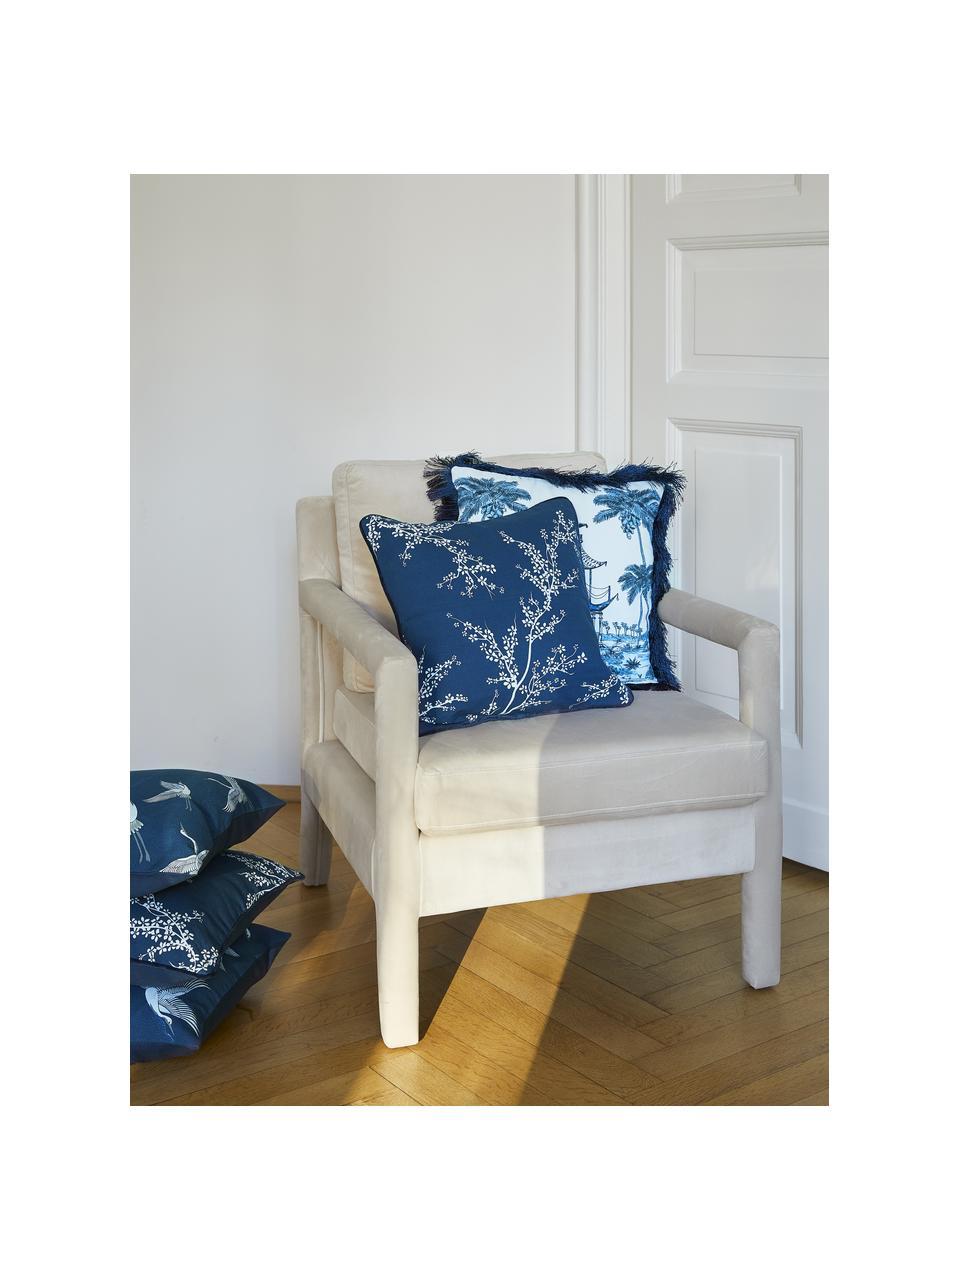 Federa arredo in cotone con motivo floreale Jada, 100% cotone, Blu, Larg. 40 x Lung. 40 cm